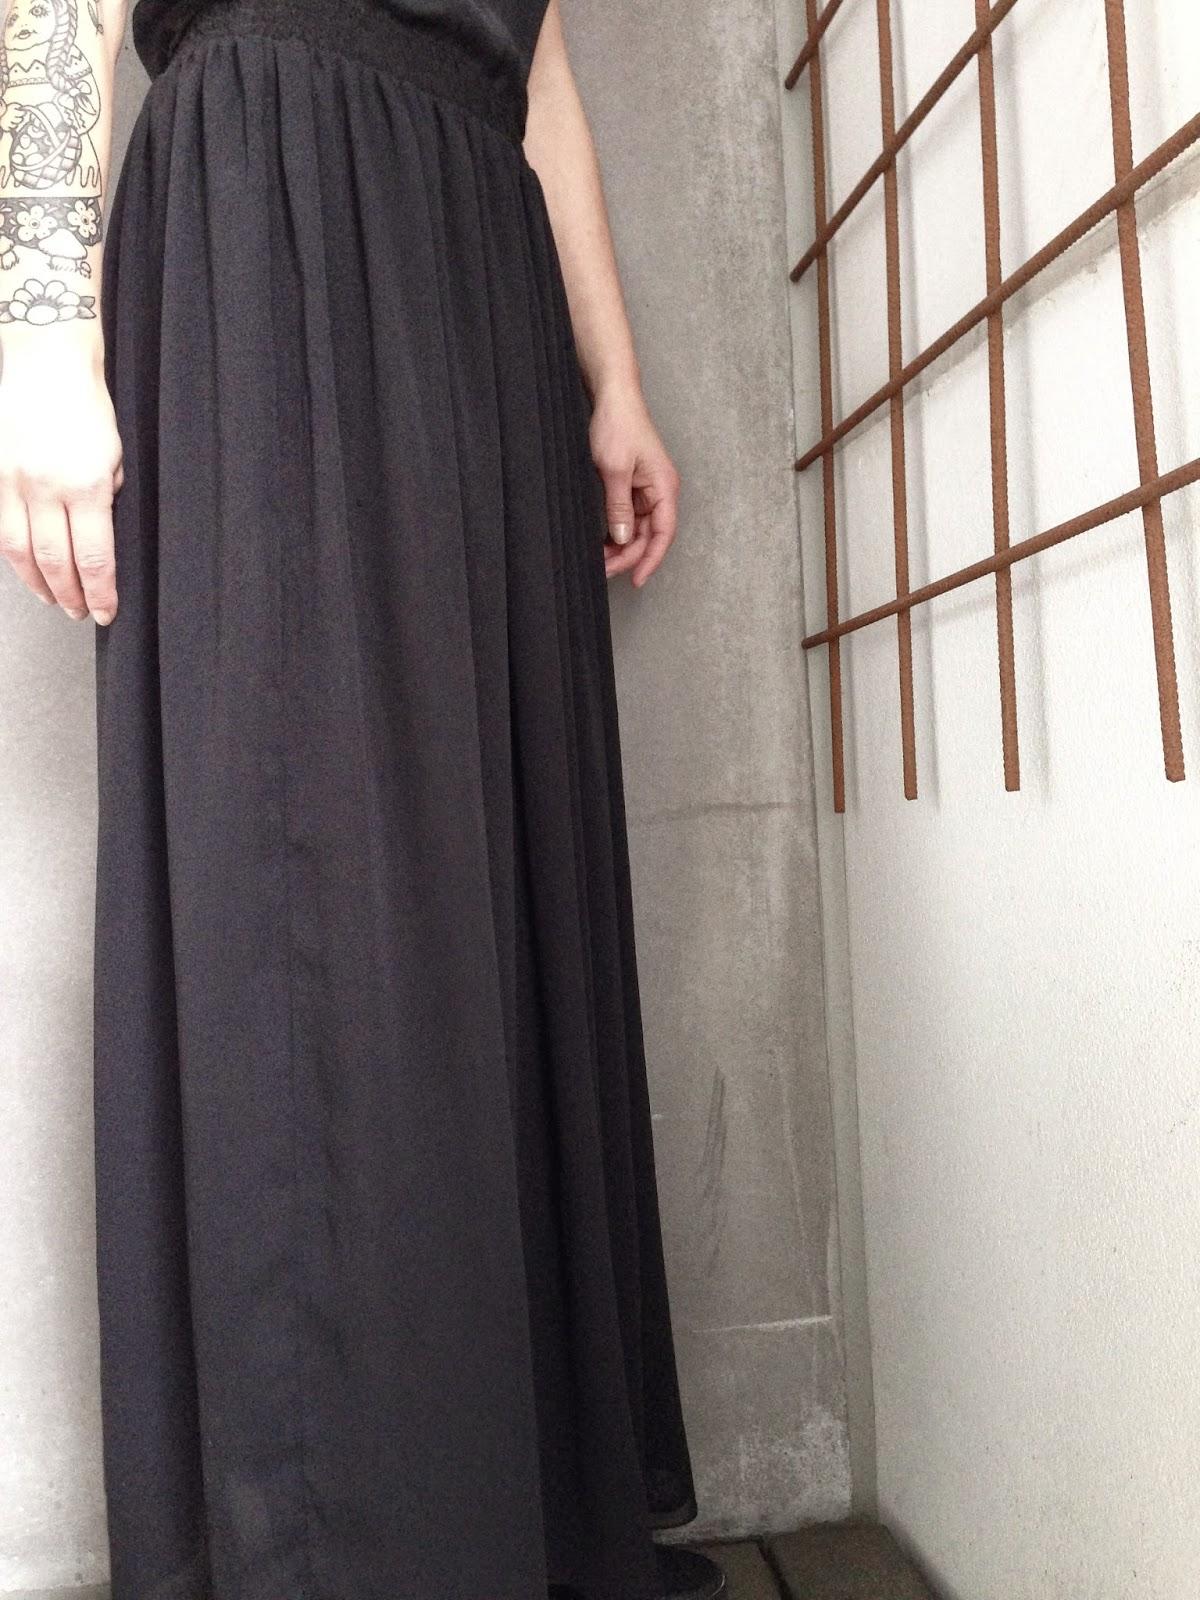 American Apparel, American Apparel skirt, American Apparel kjol